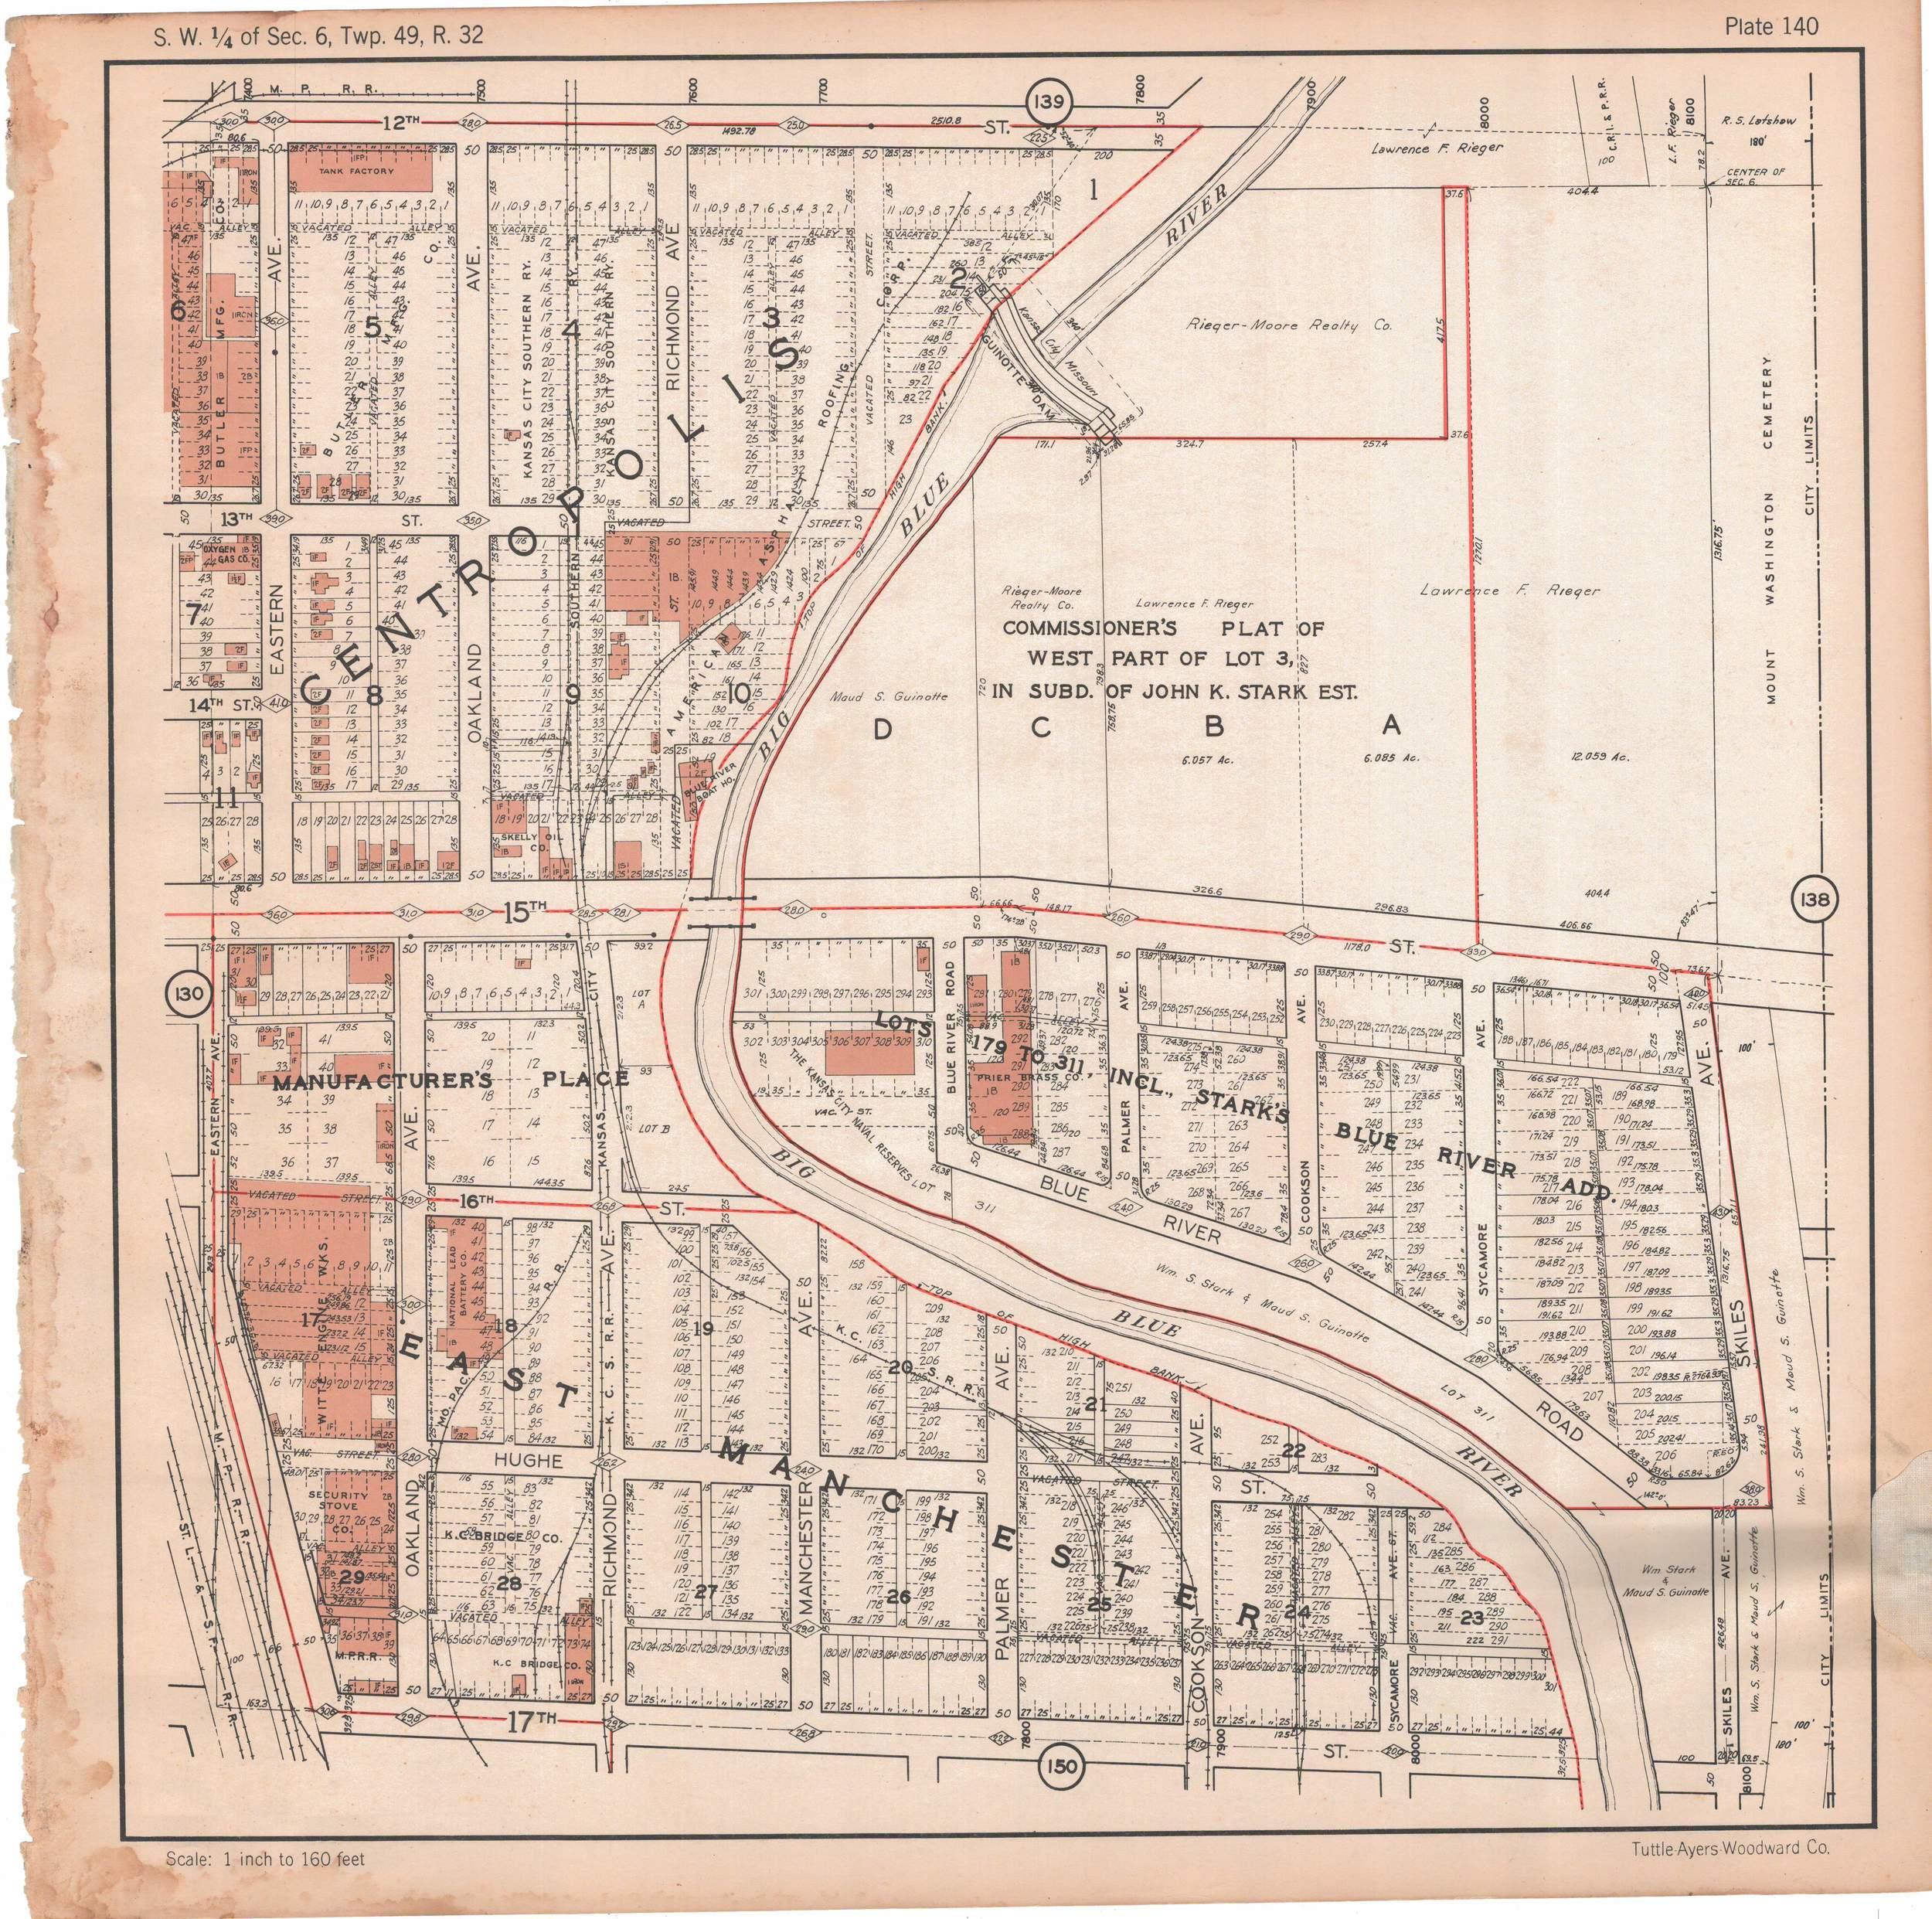 1925 TUTTLE_AYERS_Plate_140.JPG